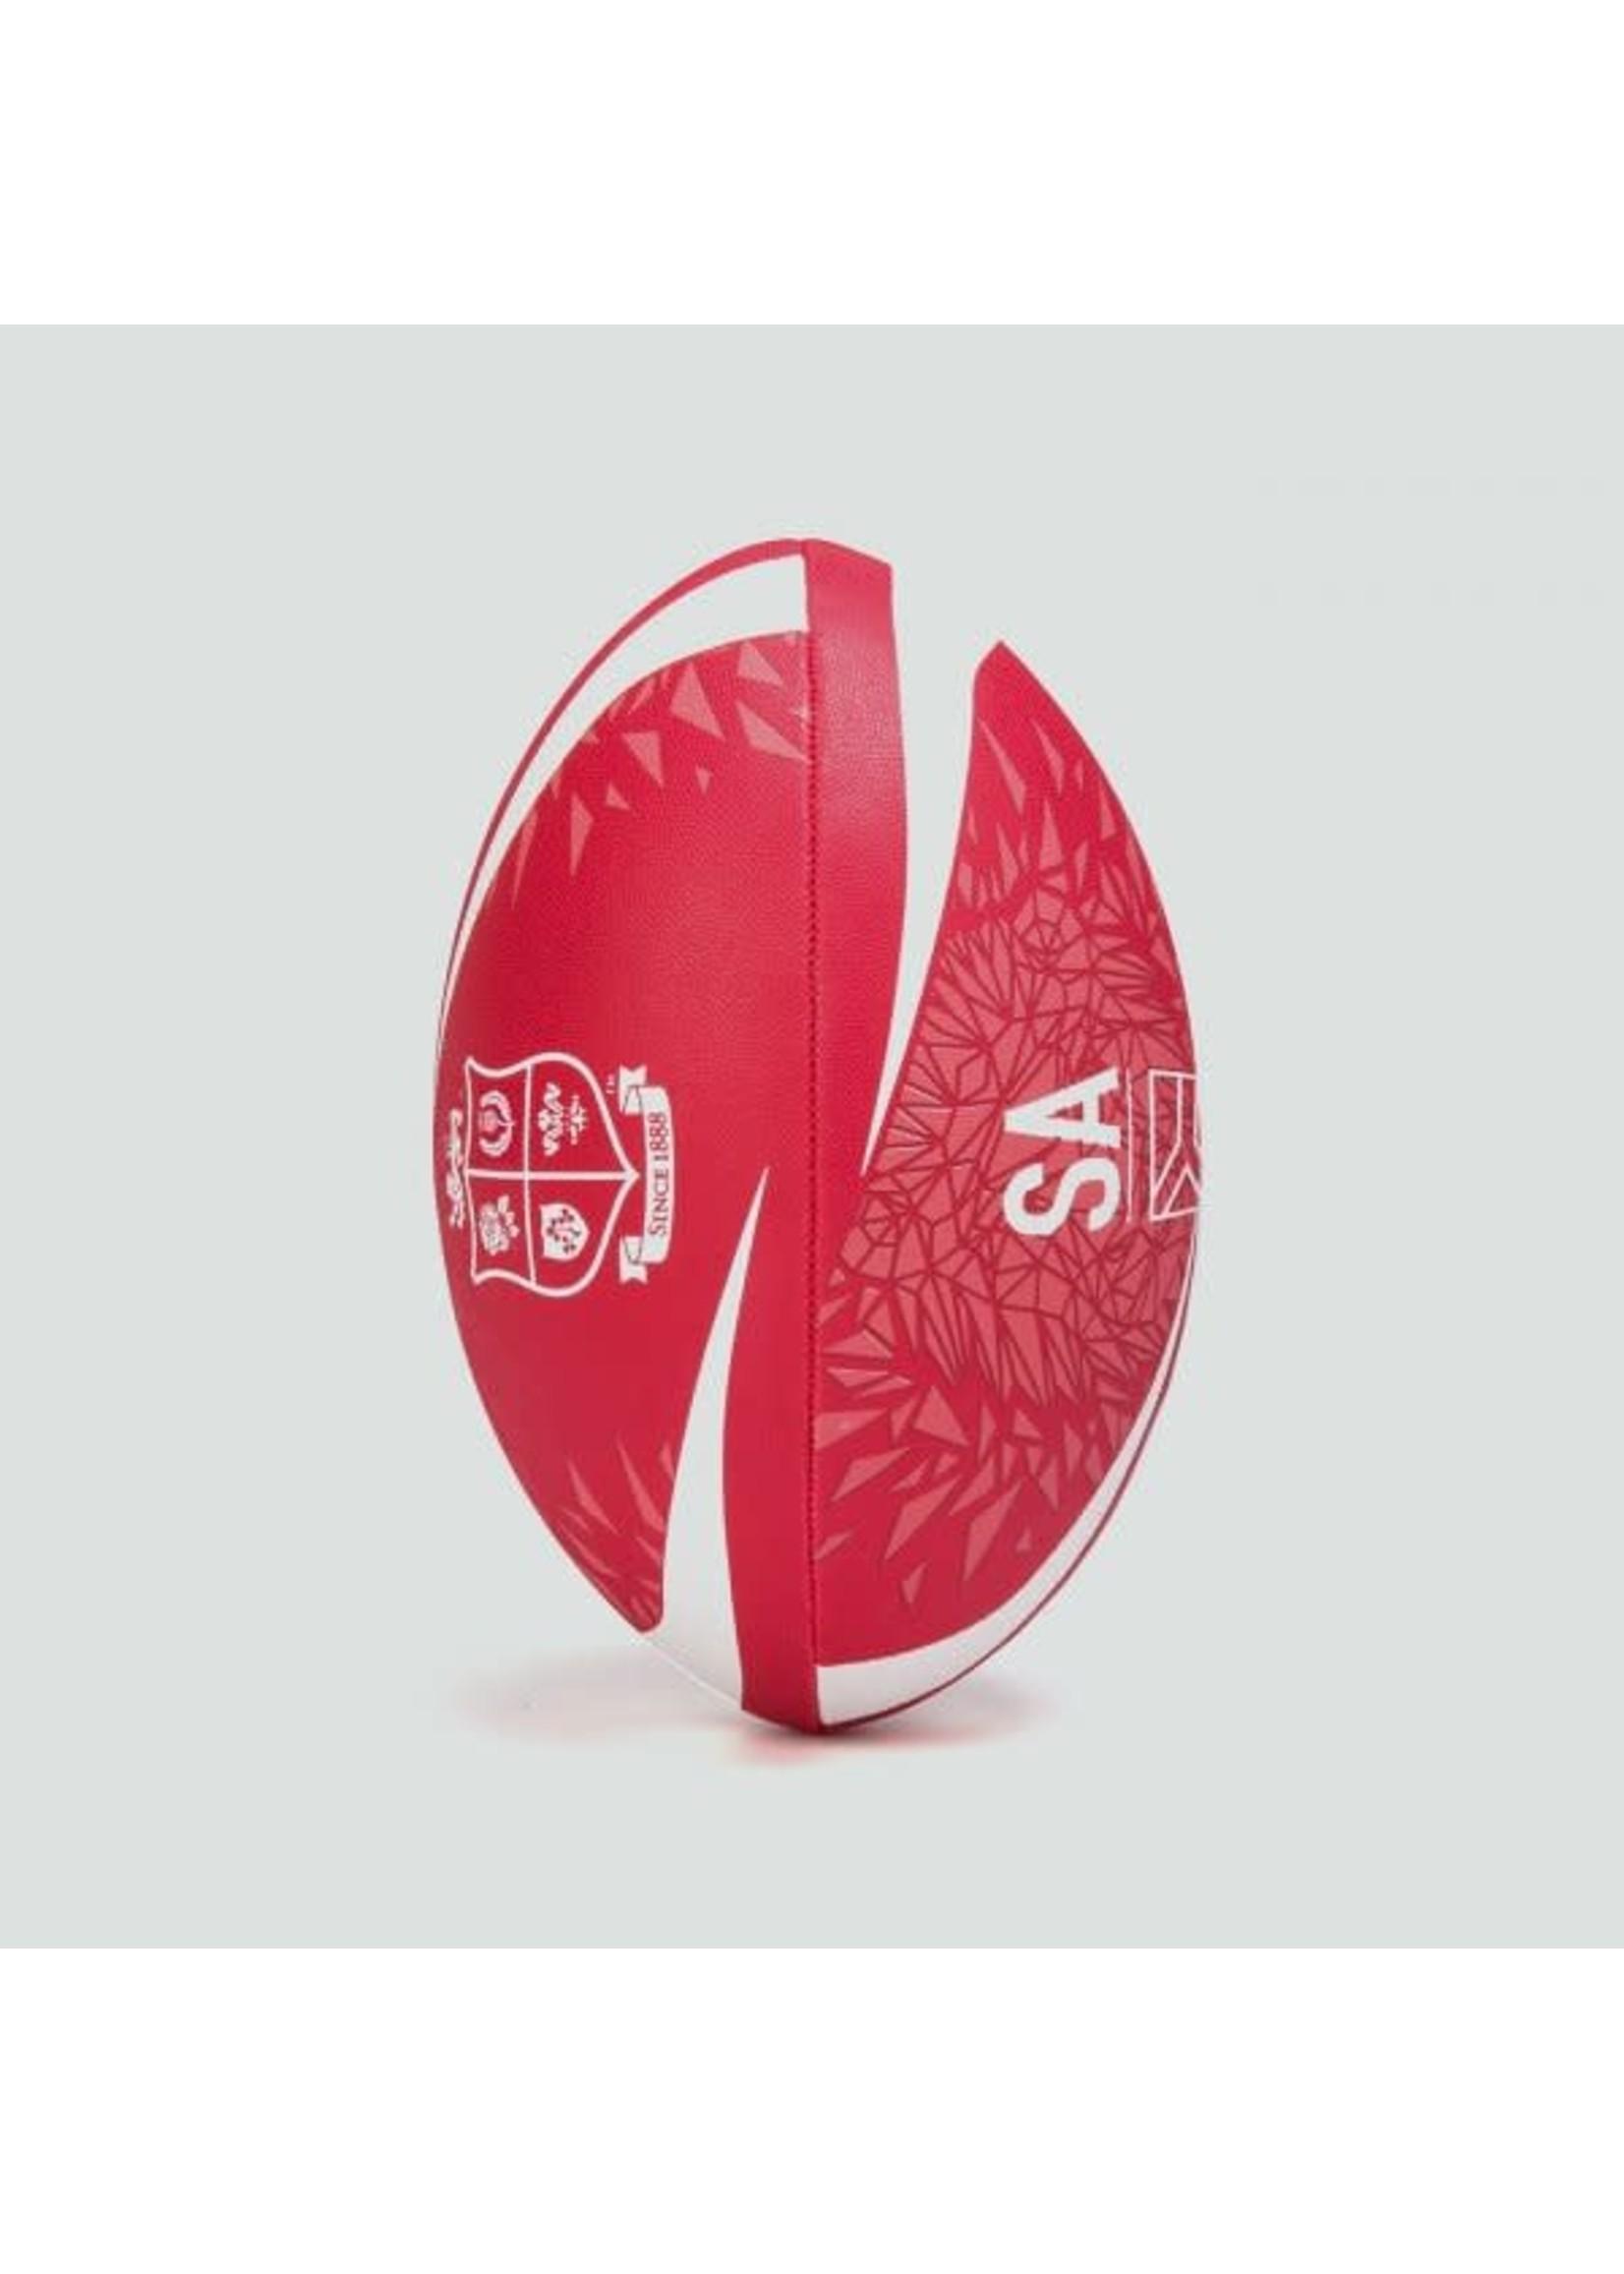 Canterbury British & Irish Lions - Thrillseeker Rugby ball - Red - Size  (2021)